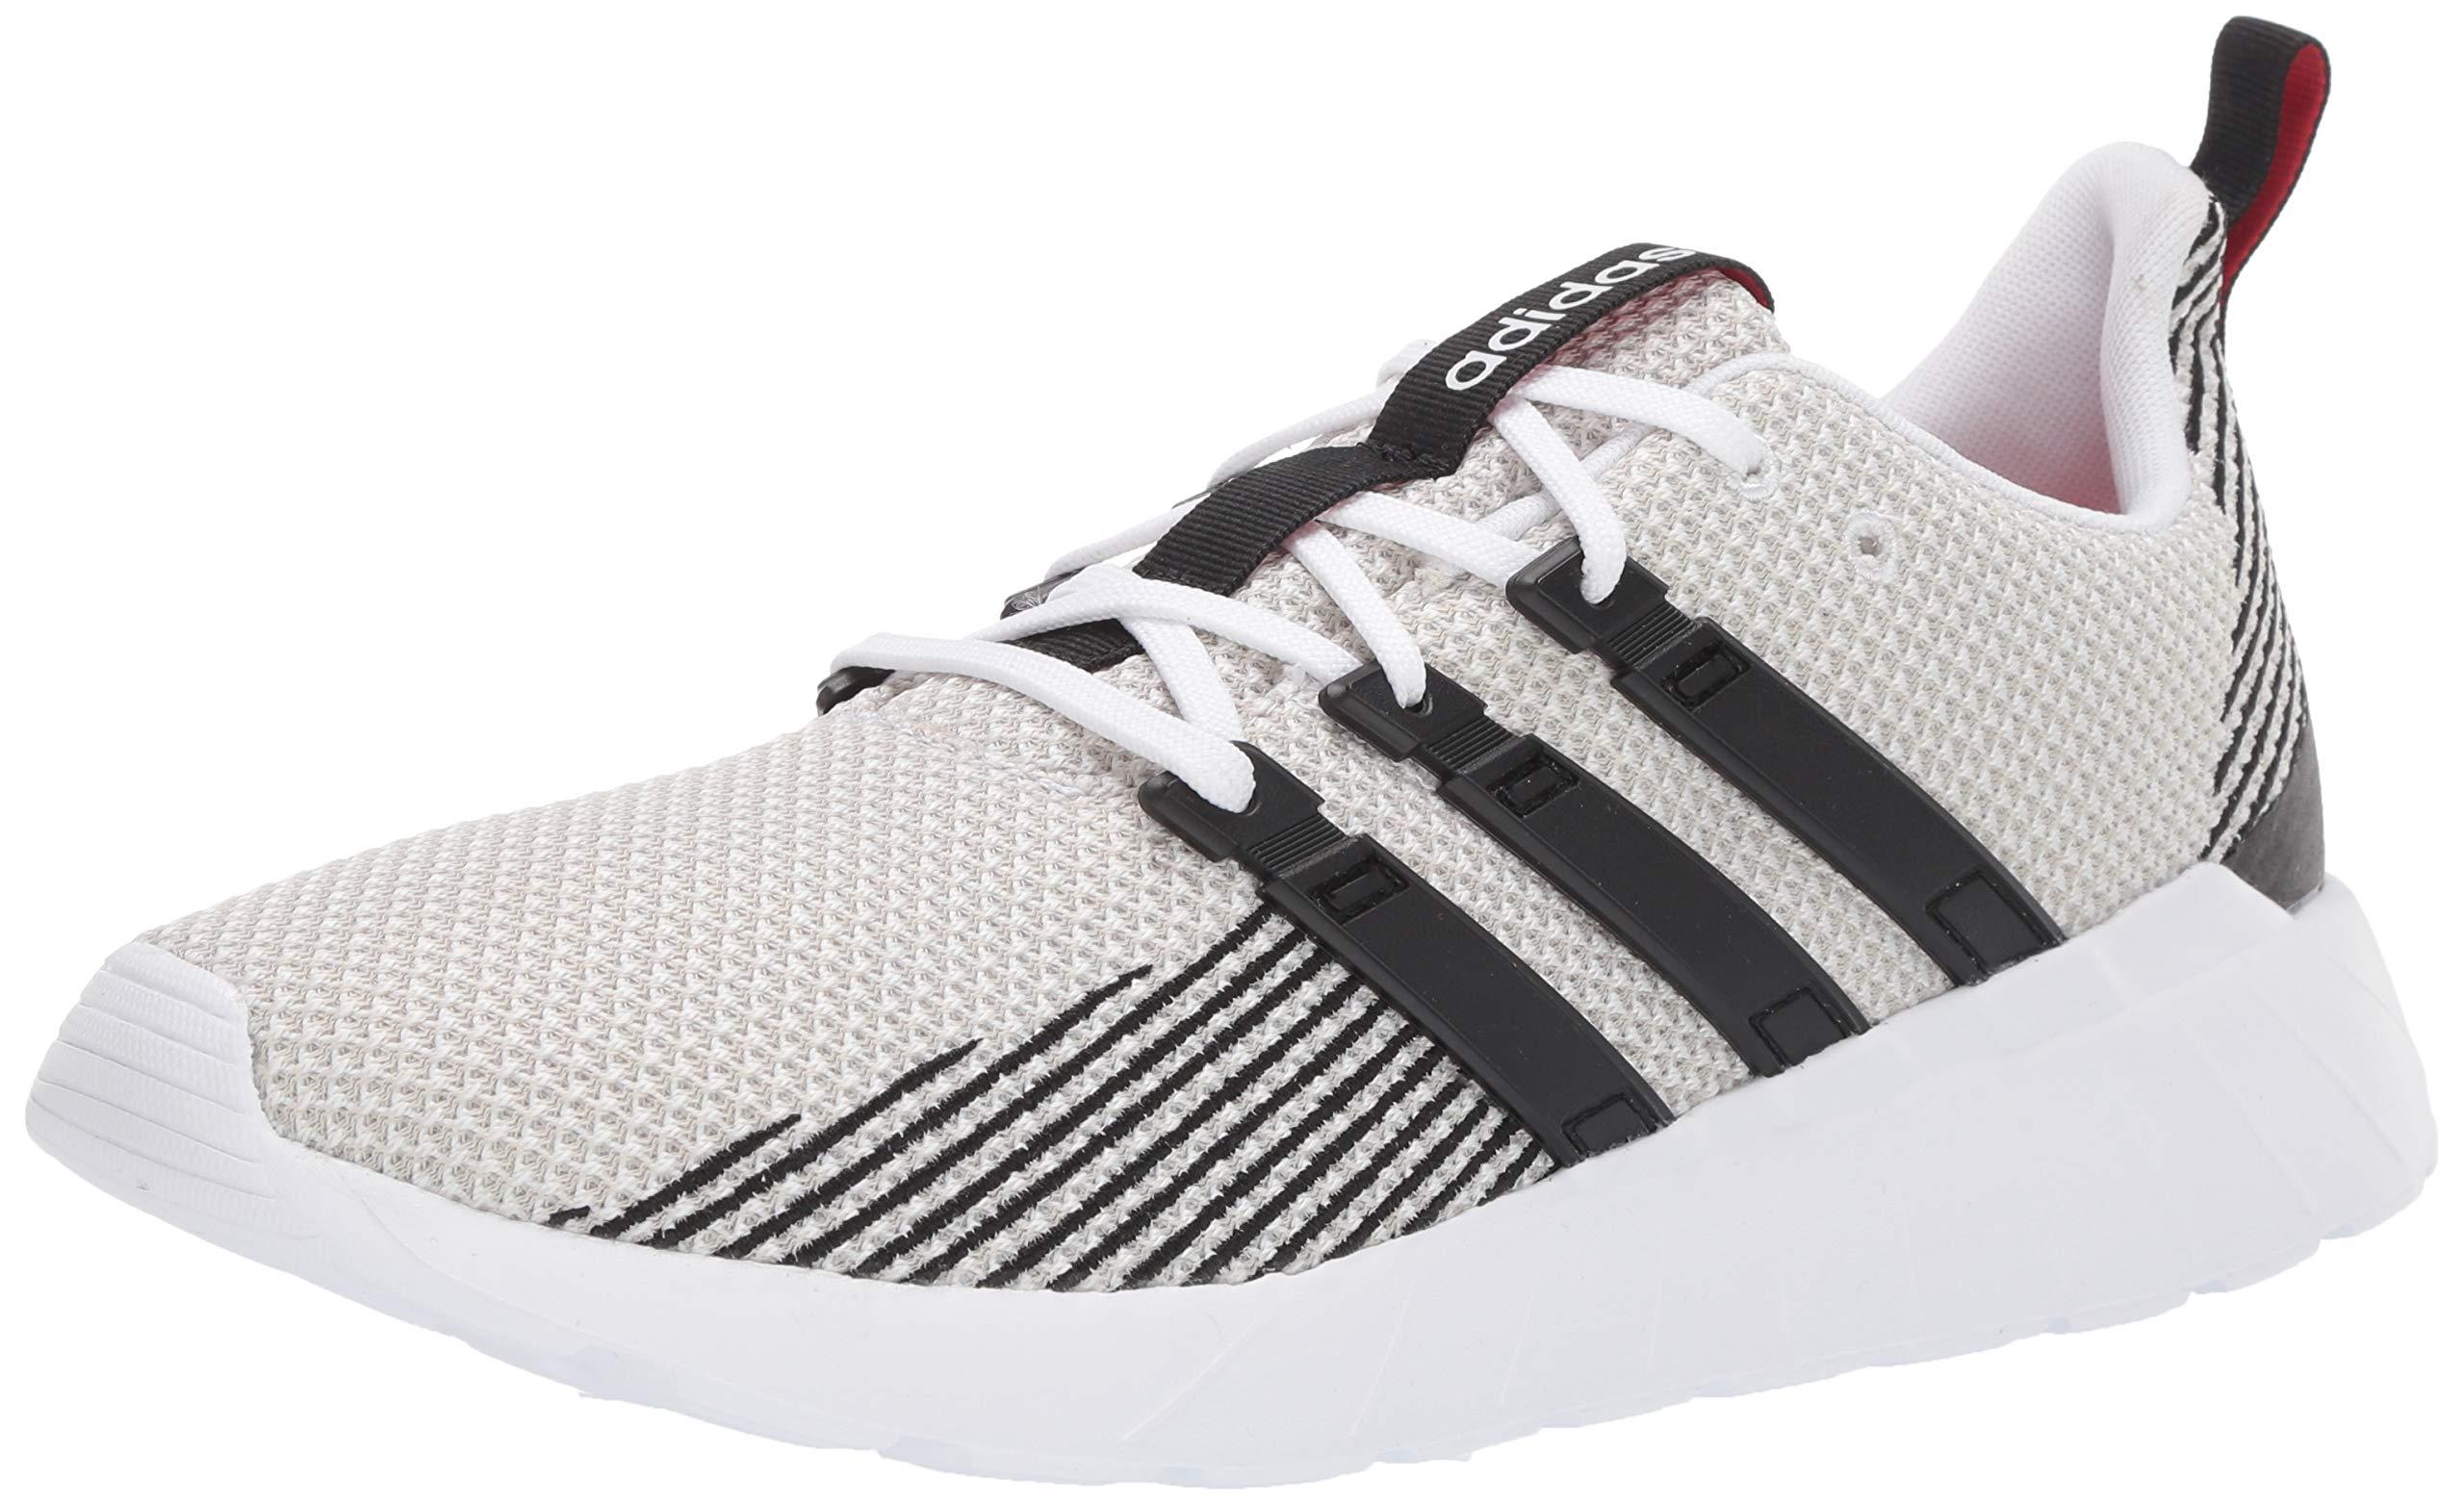 adidas Men's Questar Flow, Black/raw White, 11 M US by adidas